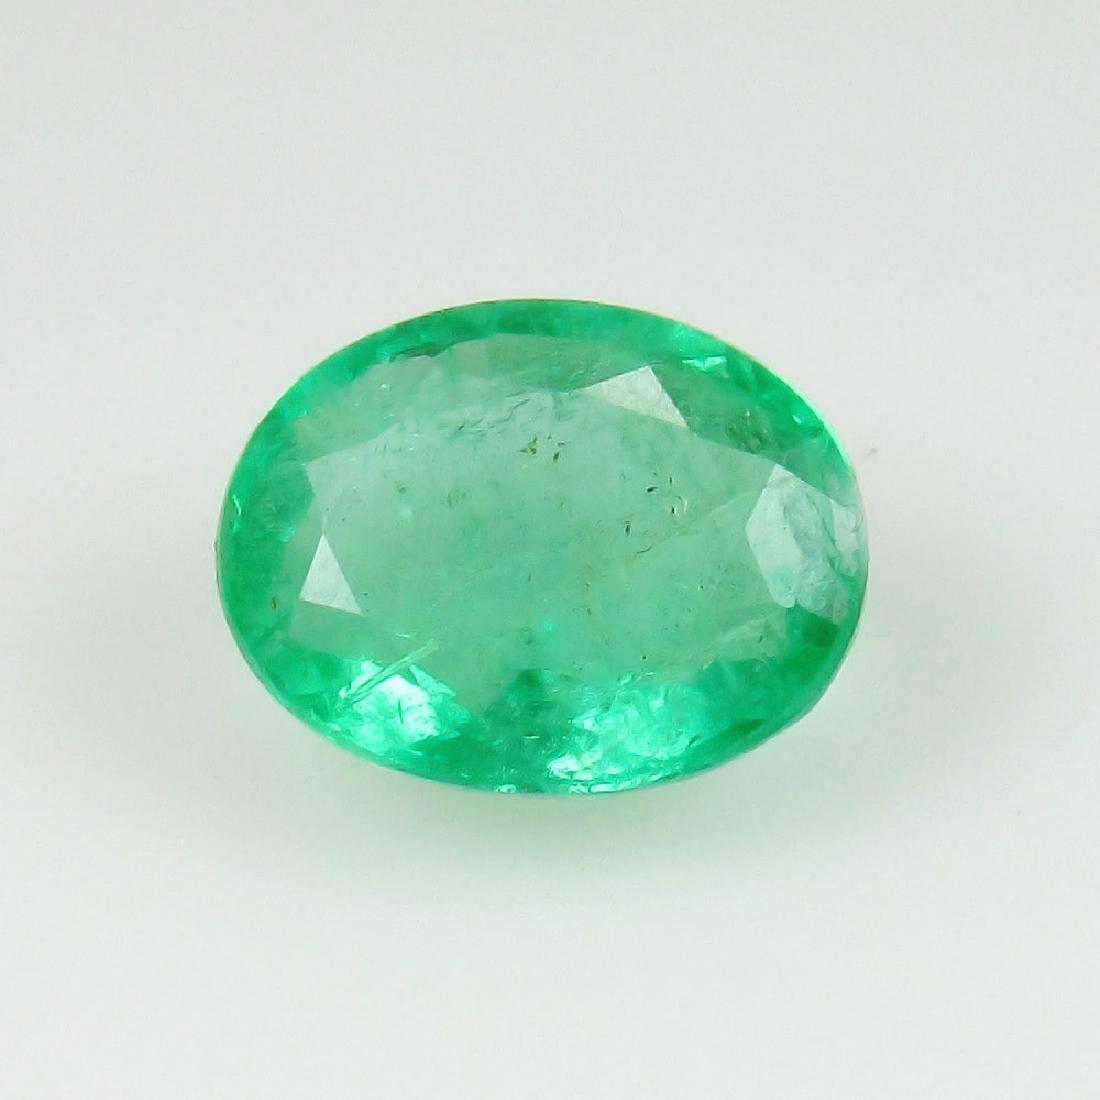 1.35 Carat Natural Zambian Loose Oval cut Emerald